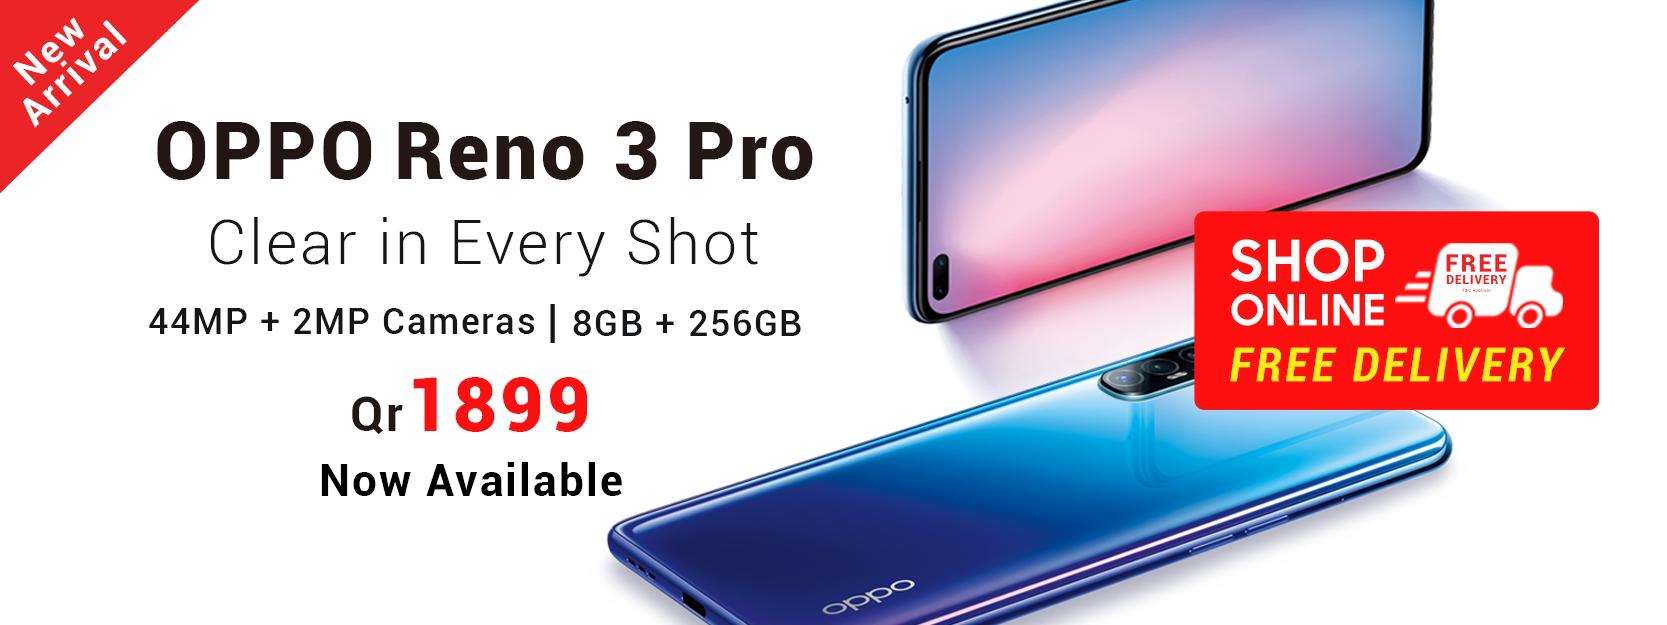 Oppo Reno 3 Pro in Qatar